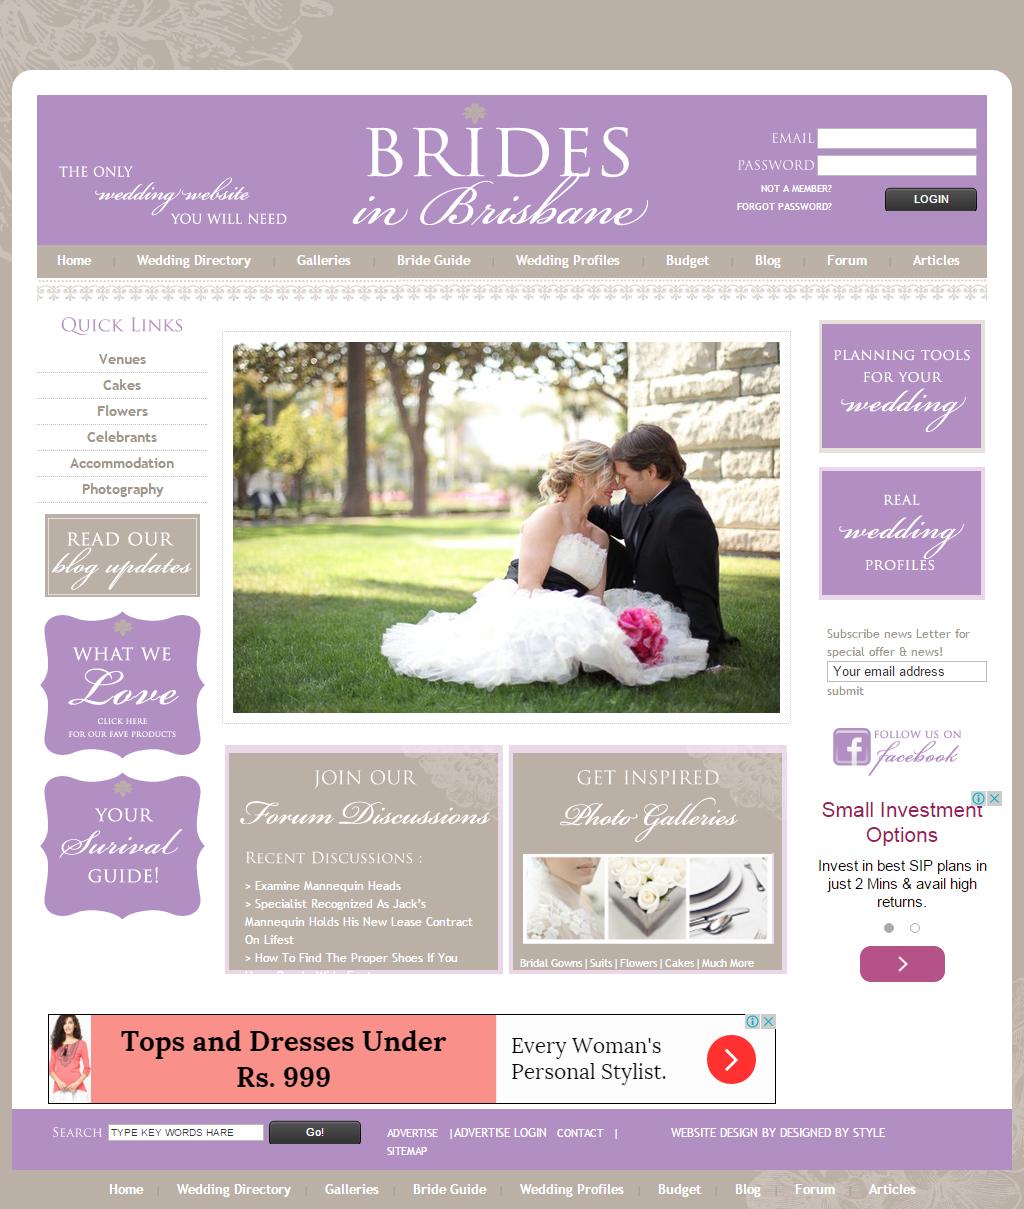 http://bridesinbrisbane.com.au/